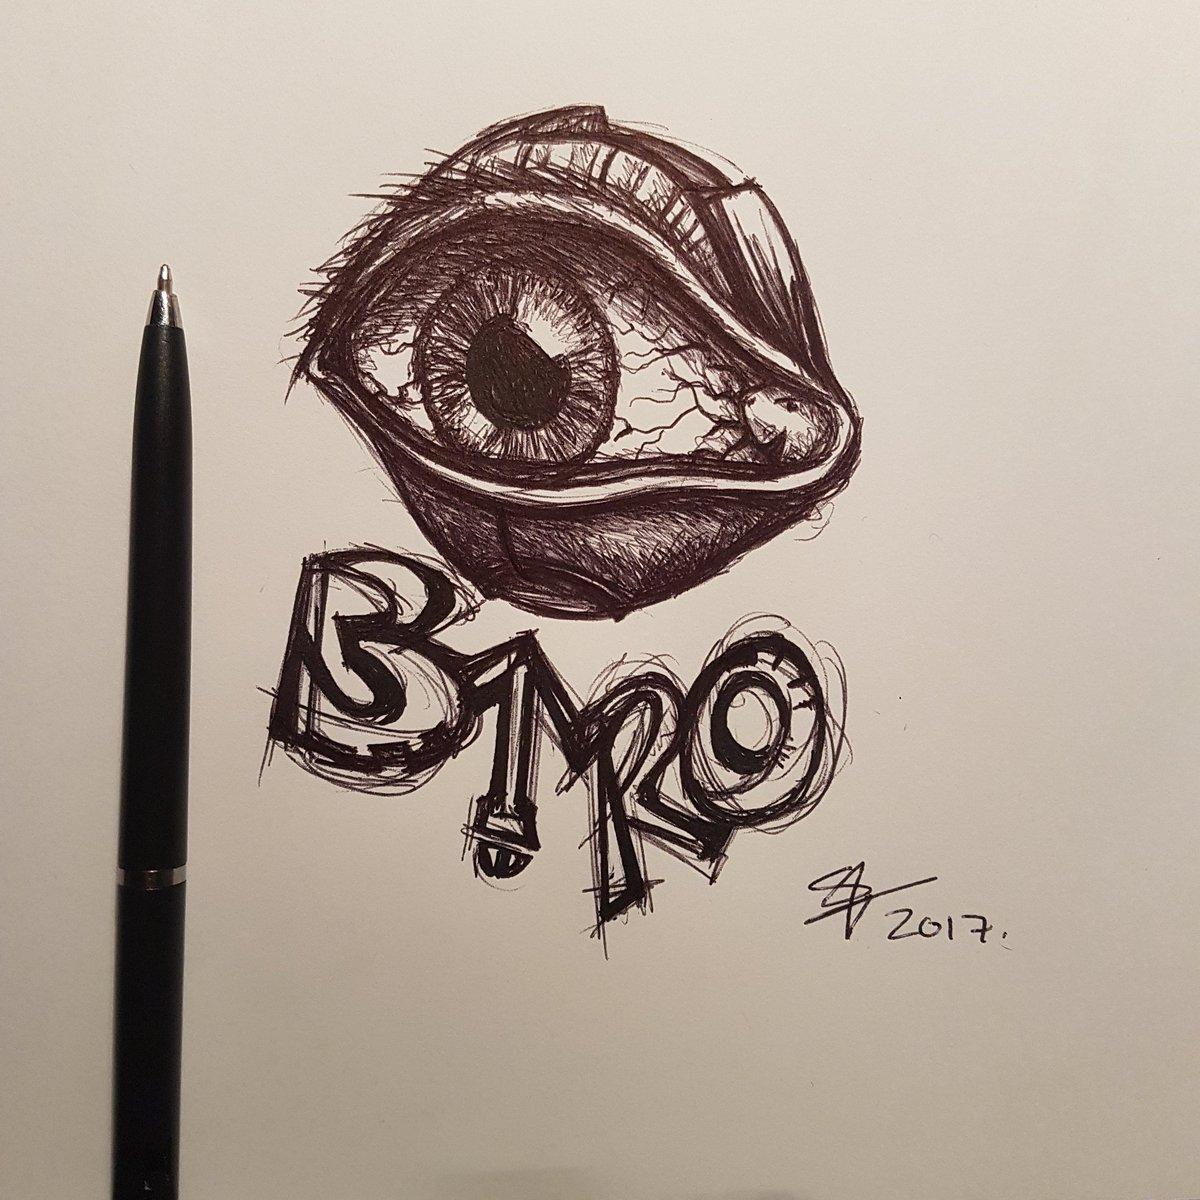 "Shane on Twitter: ""Here we have a b'eye'ro doodle. #eyes #art #artist #lol  #biro #inklusion #doodleinvasion @HeadwayNotts @Daily__Doodle @LeftLion…  https://t.co/D4SJKwq0Pk"""